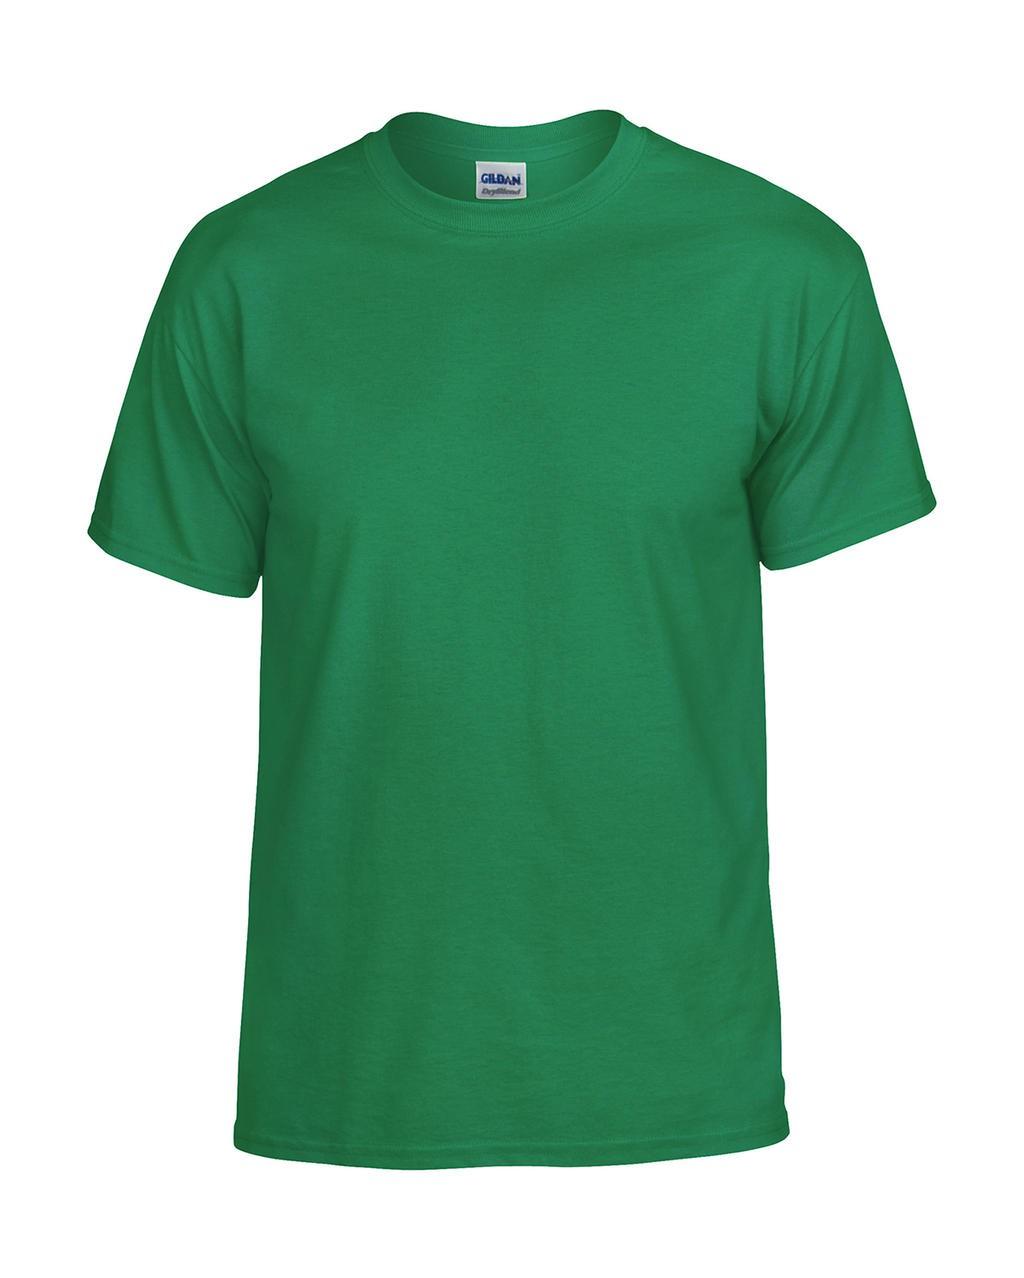 Gildan dryblend adult t shirt 8000 for Gildan 8000 t shirt